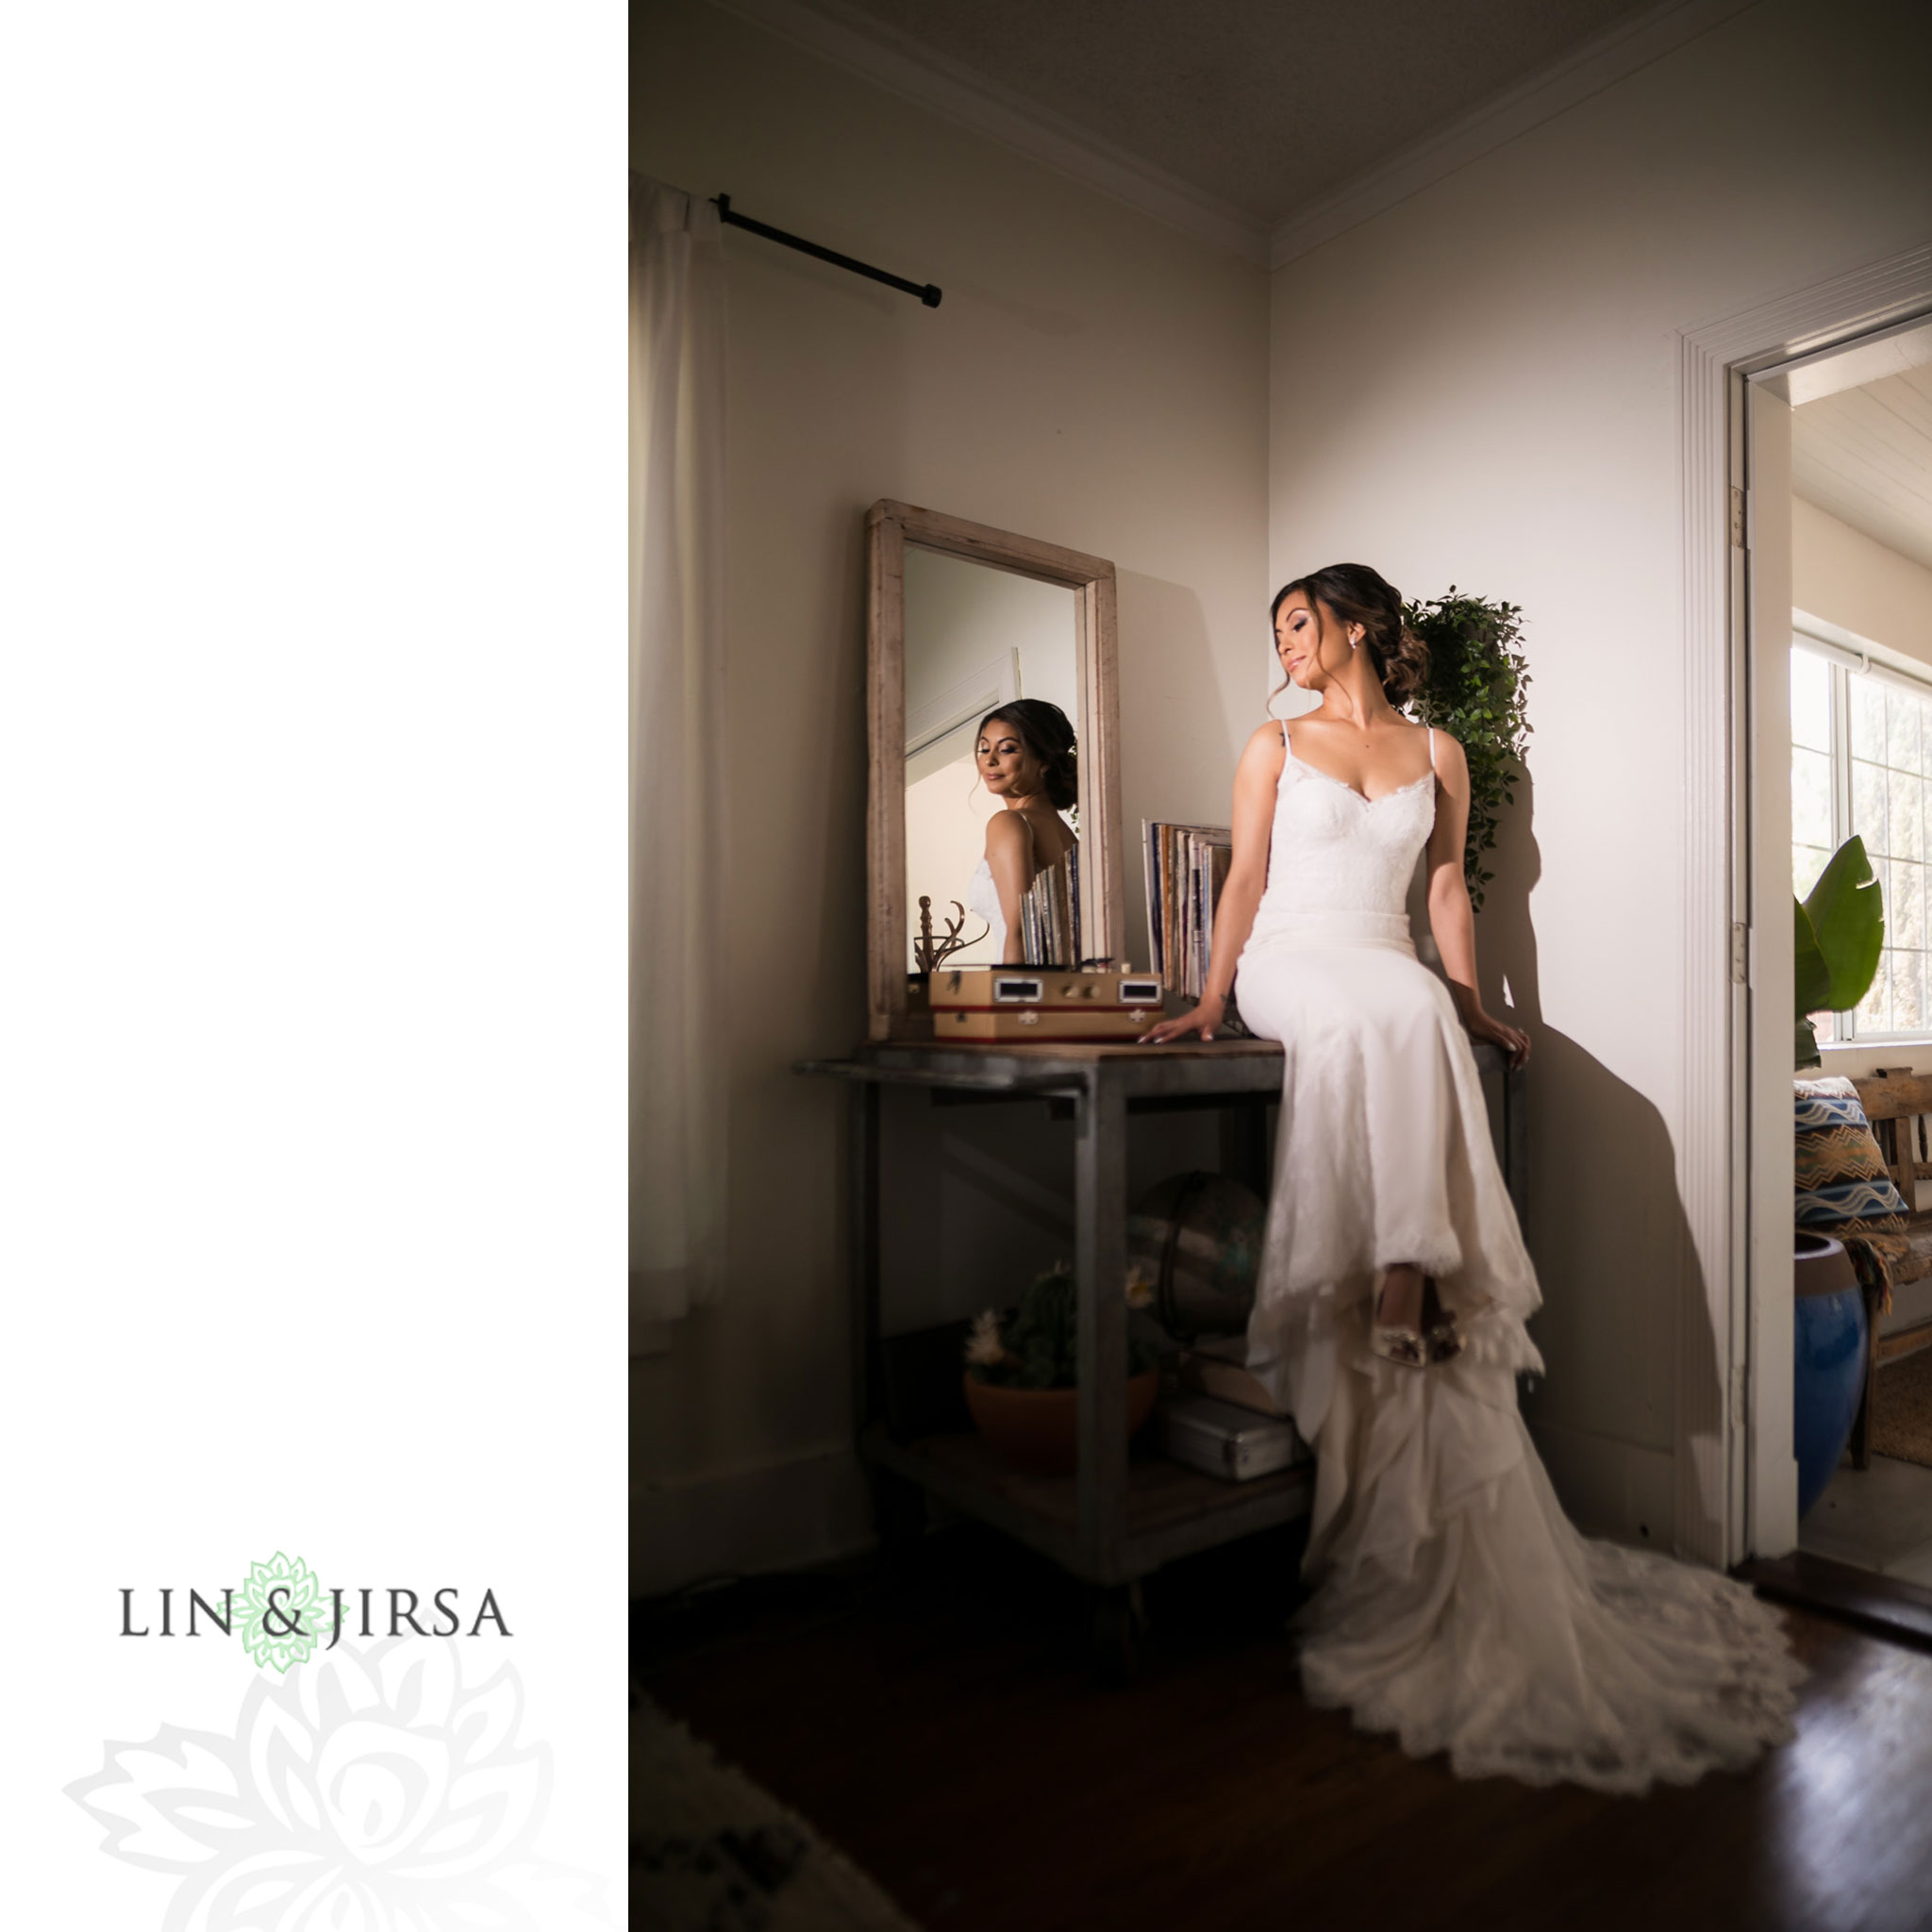 007 york manor los angeles wedding photography